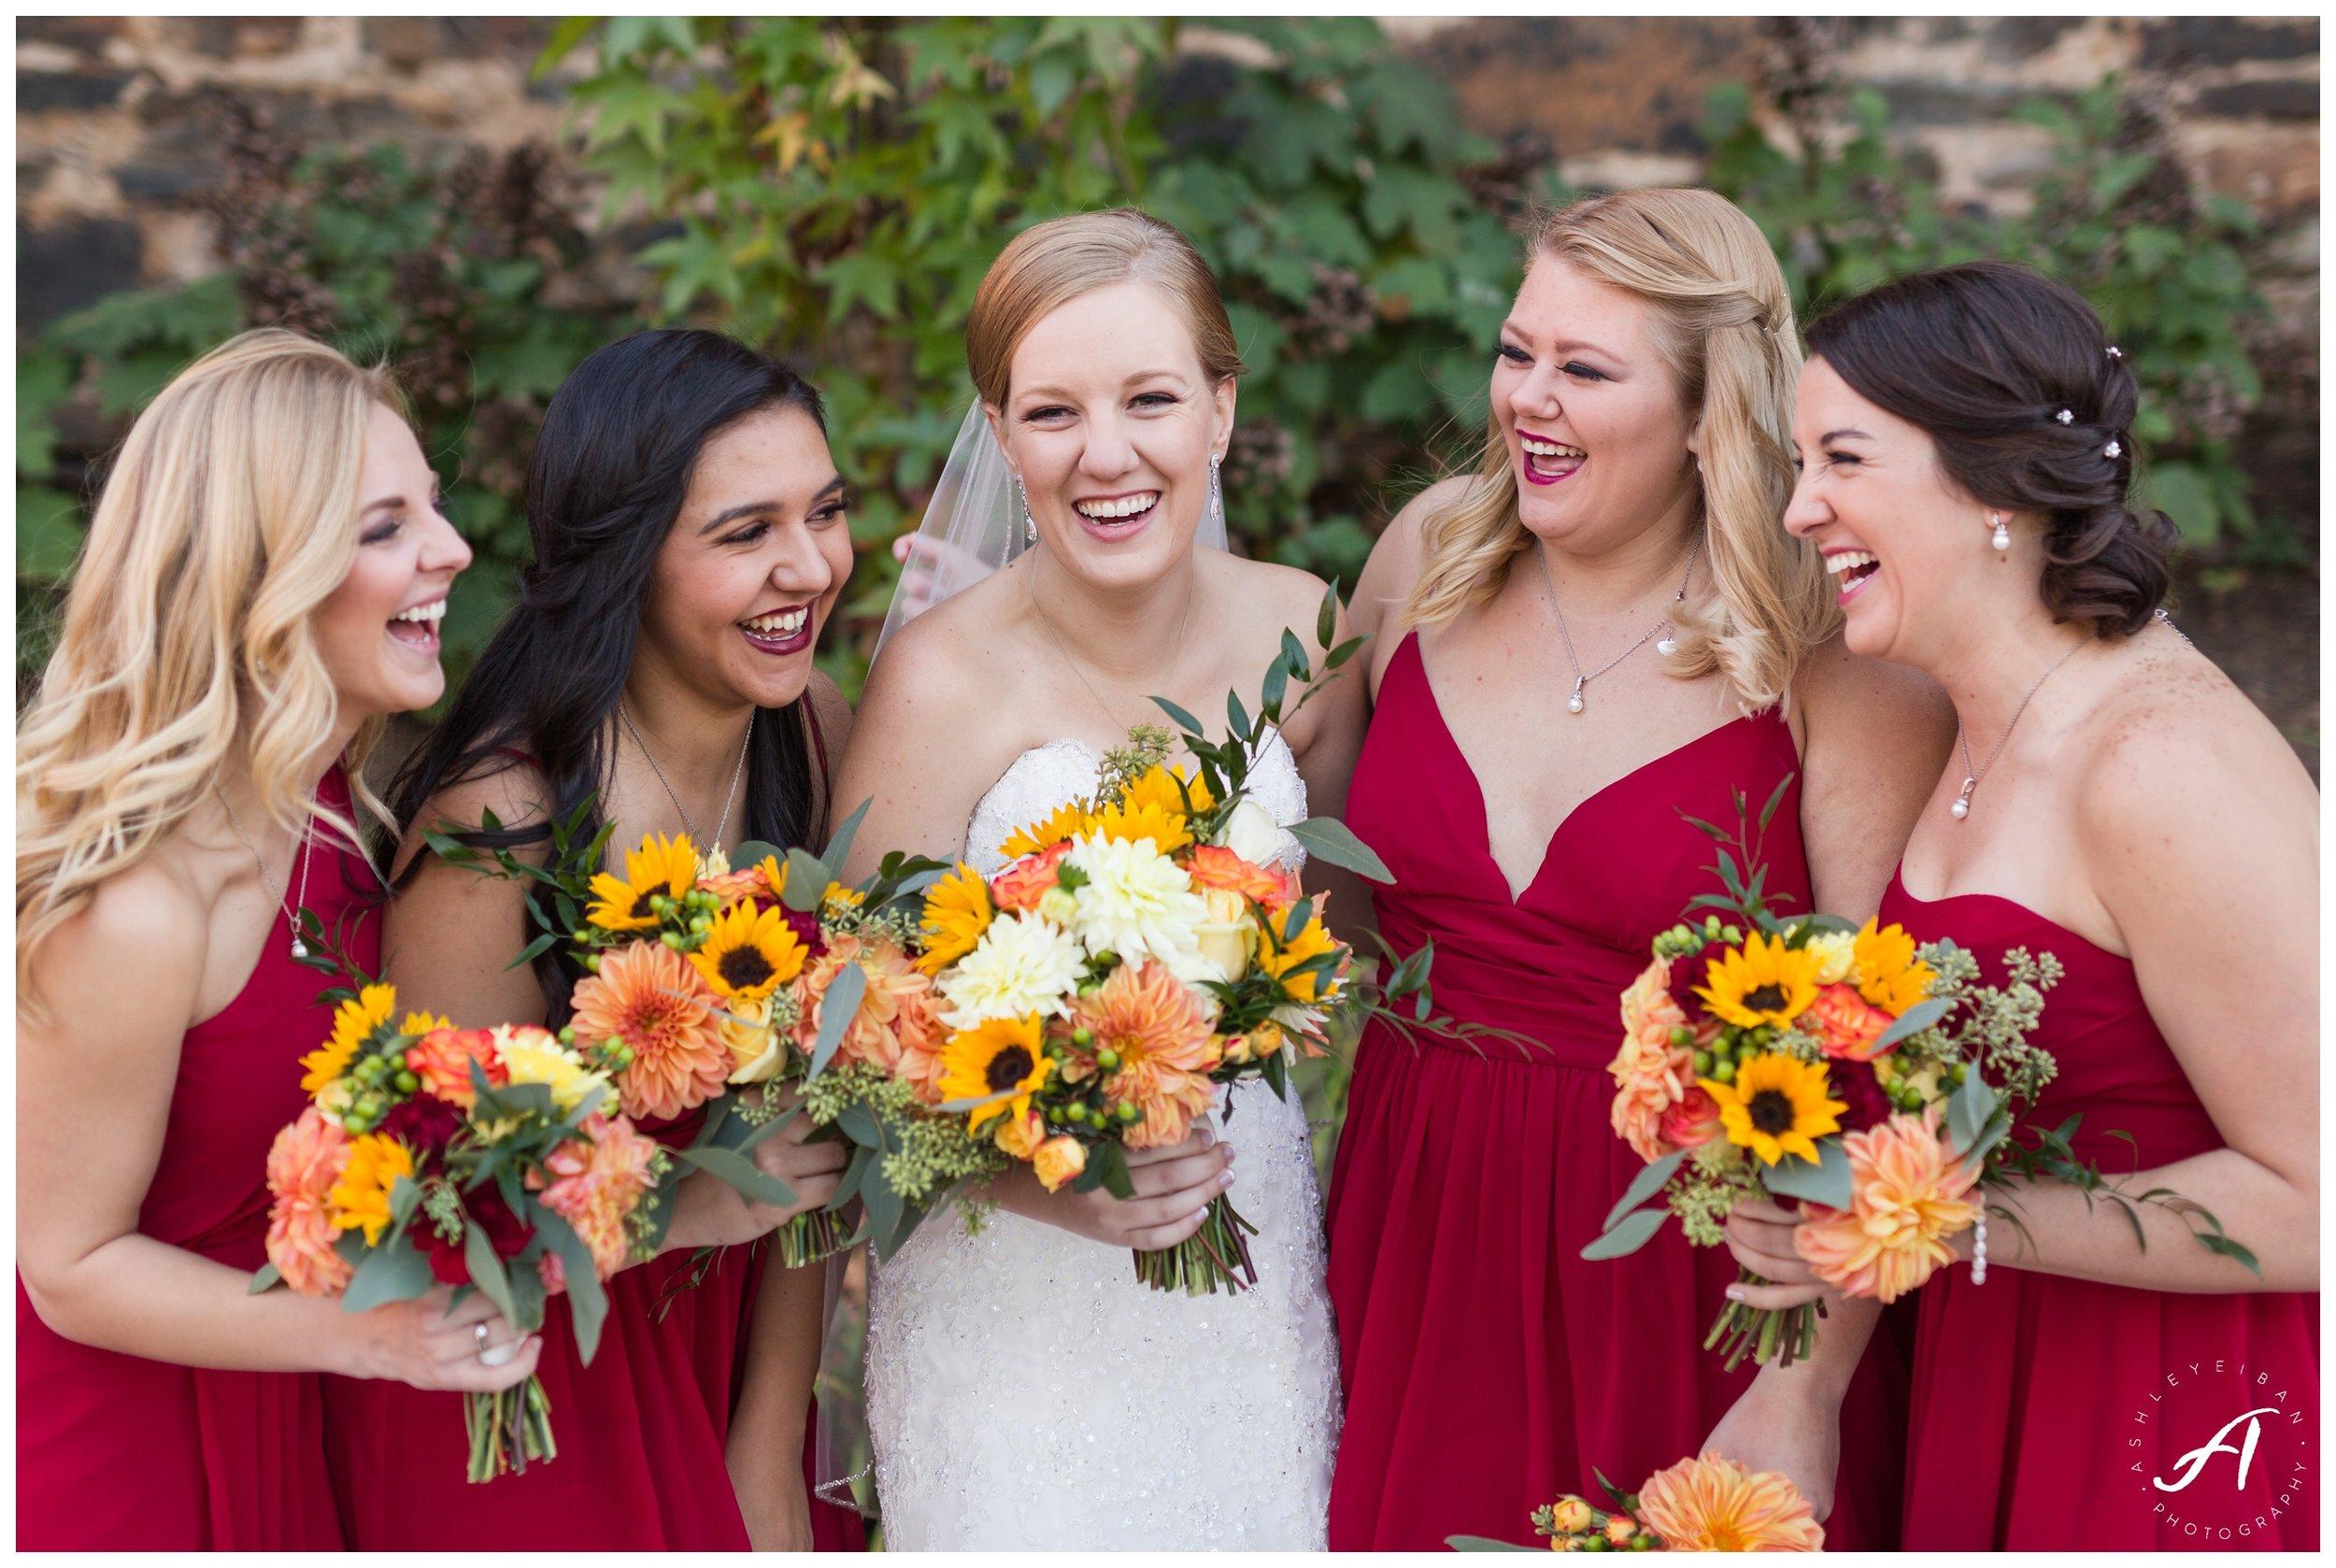 Craddock Terry Wedding in Downtown Lynchburg, Virginia || Central VA Wedding Photographer || Fall Wedding in the Blue Ridge Mountains